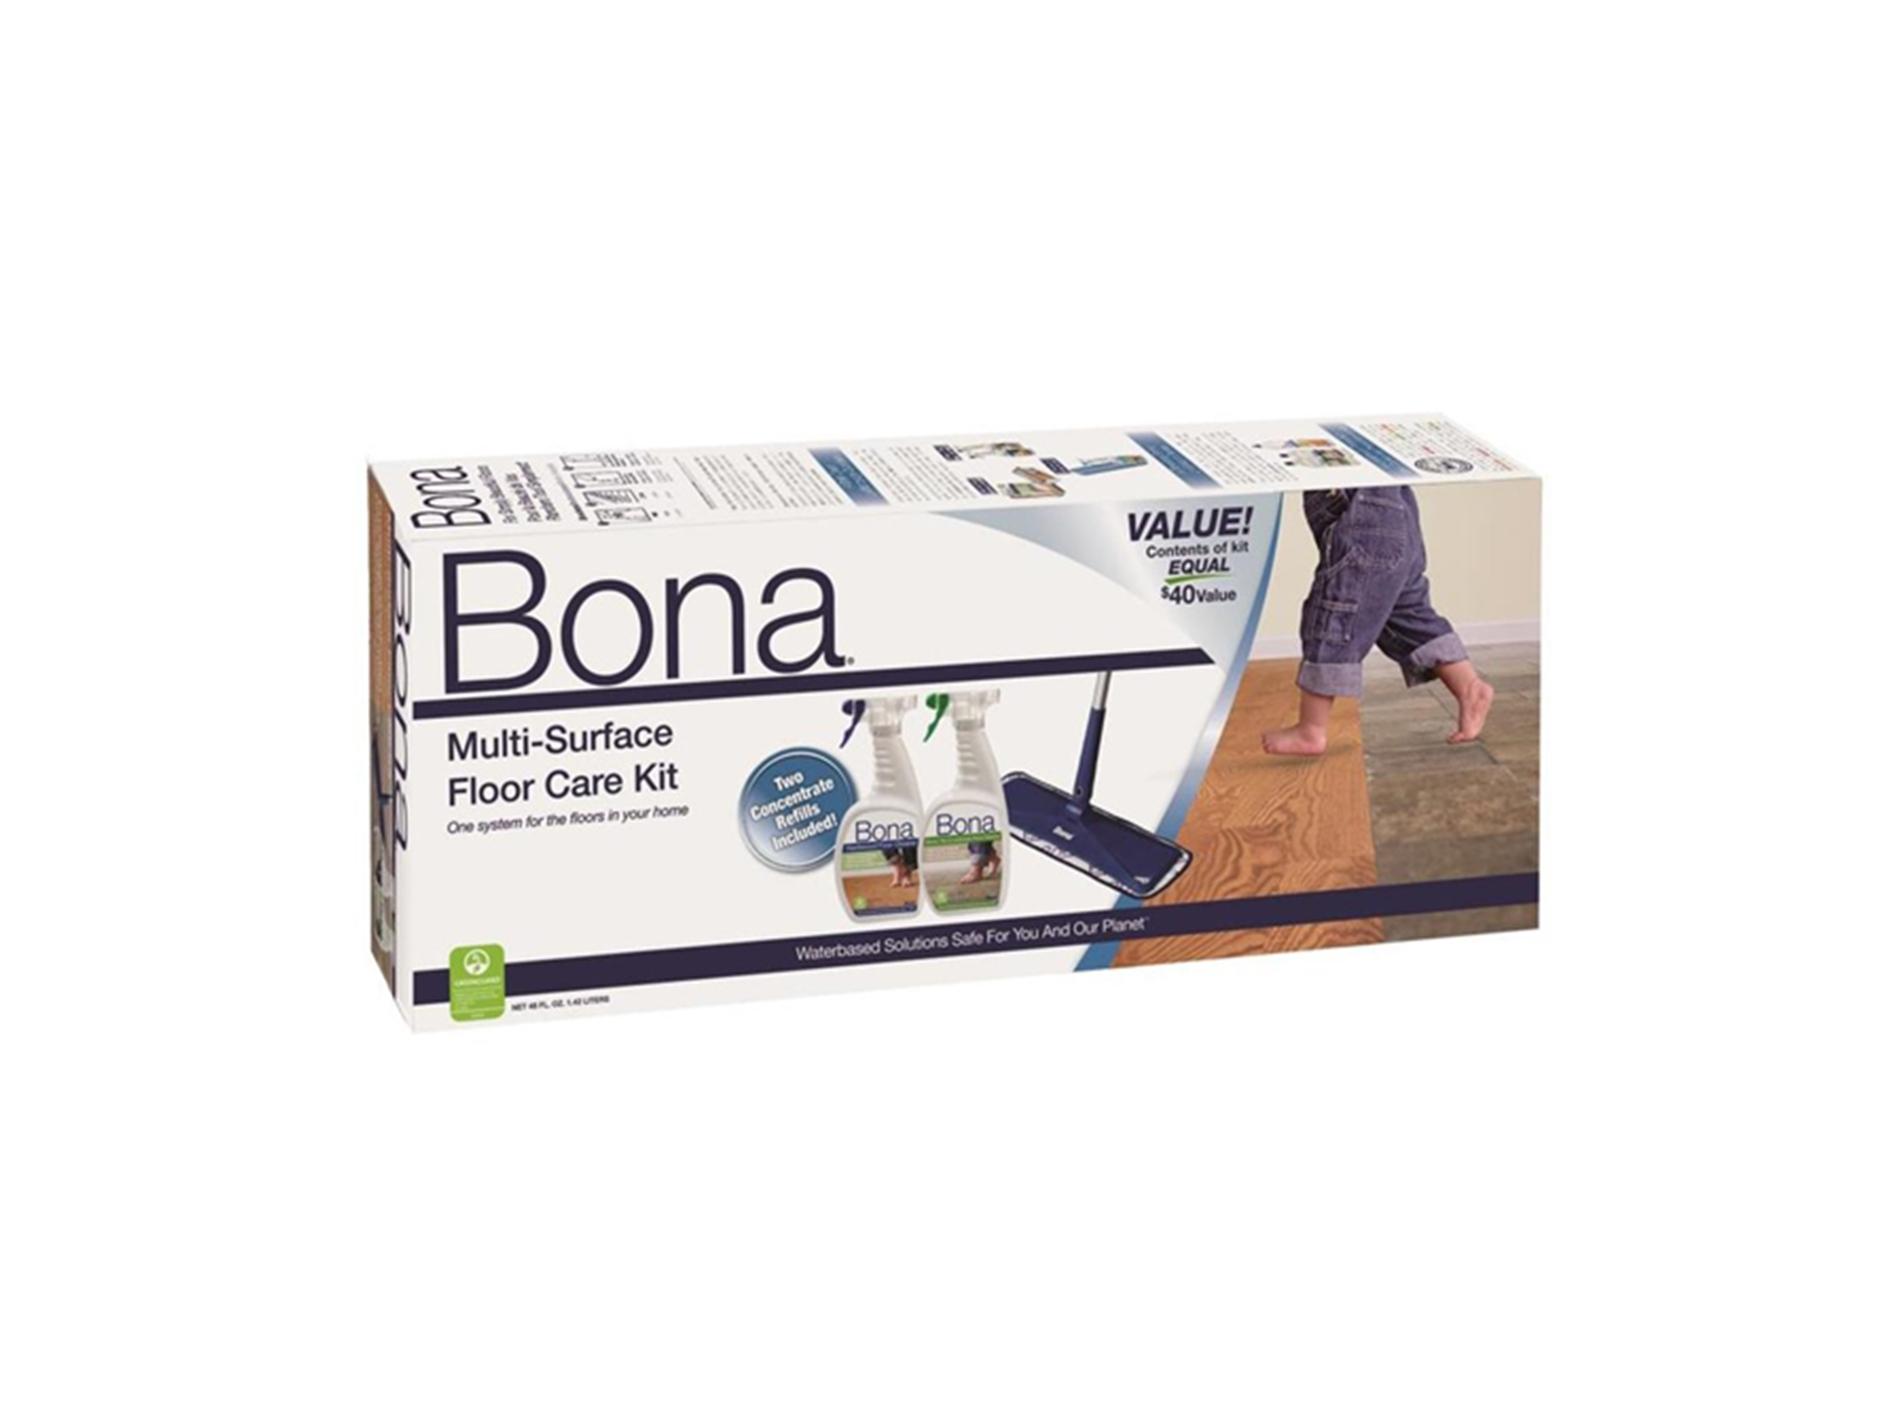 Bona Multi Surface Floor Care System Cardy Vacuum